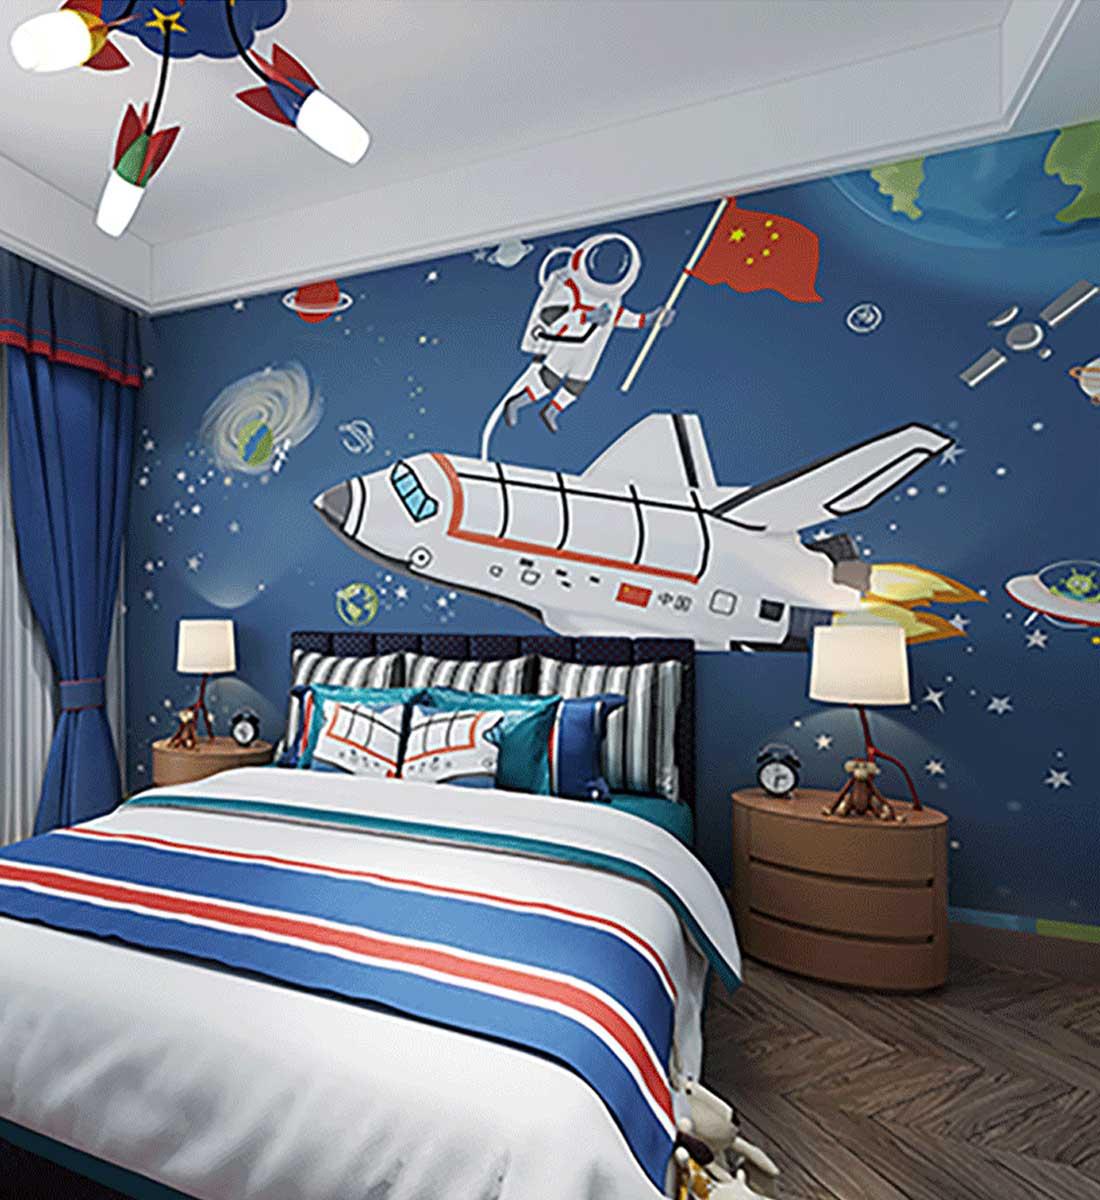 JCC天洋宇航员火箭儿童房定制墙布